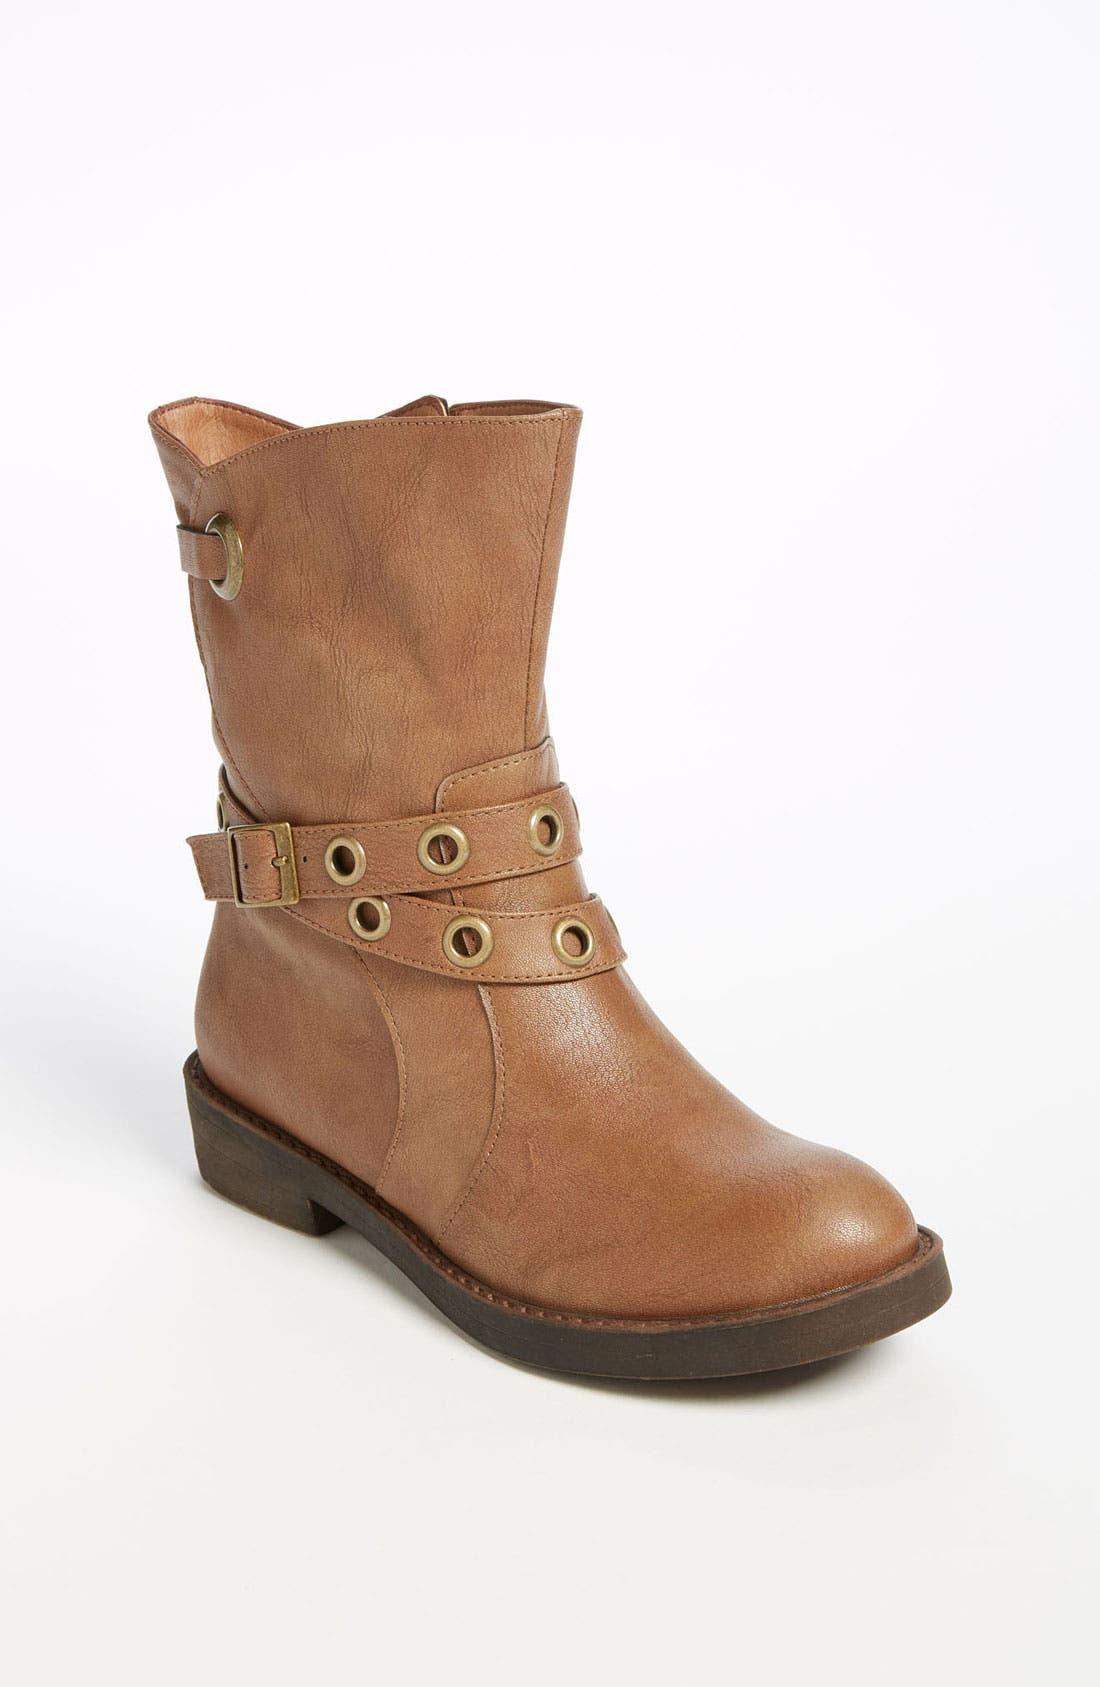 Main Image - Jessica Simpson 'Ellice' Boot (Little Kid & Big Kid) (Online Only)